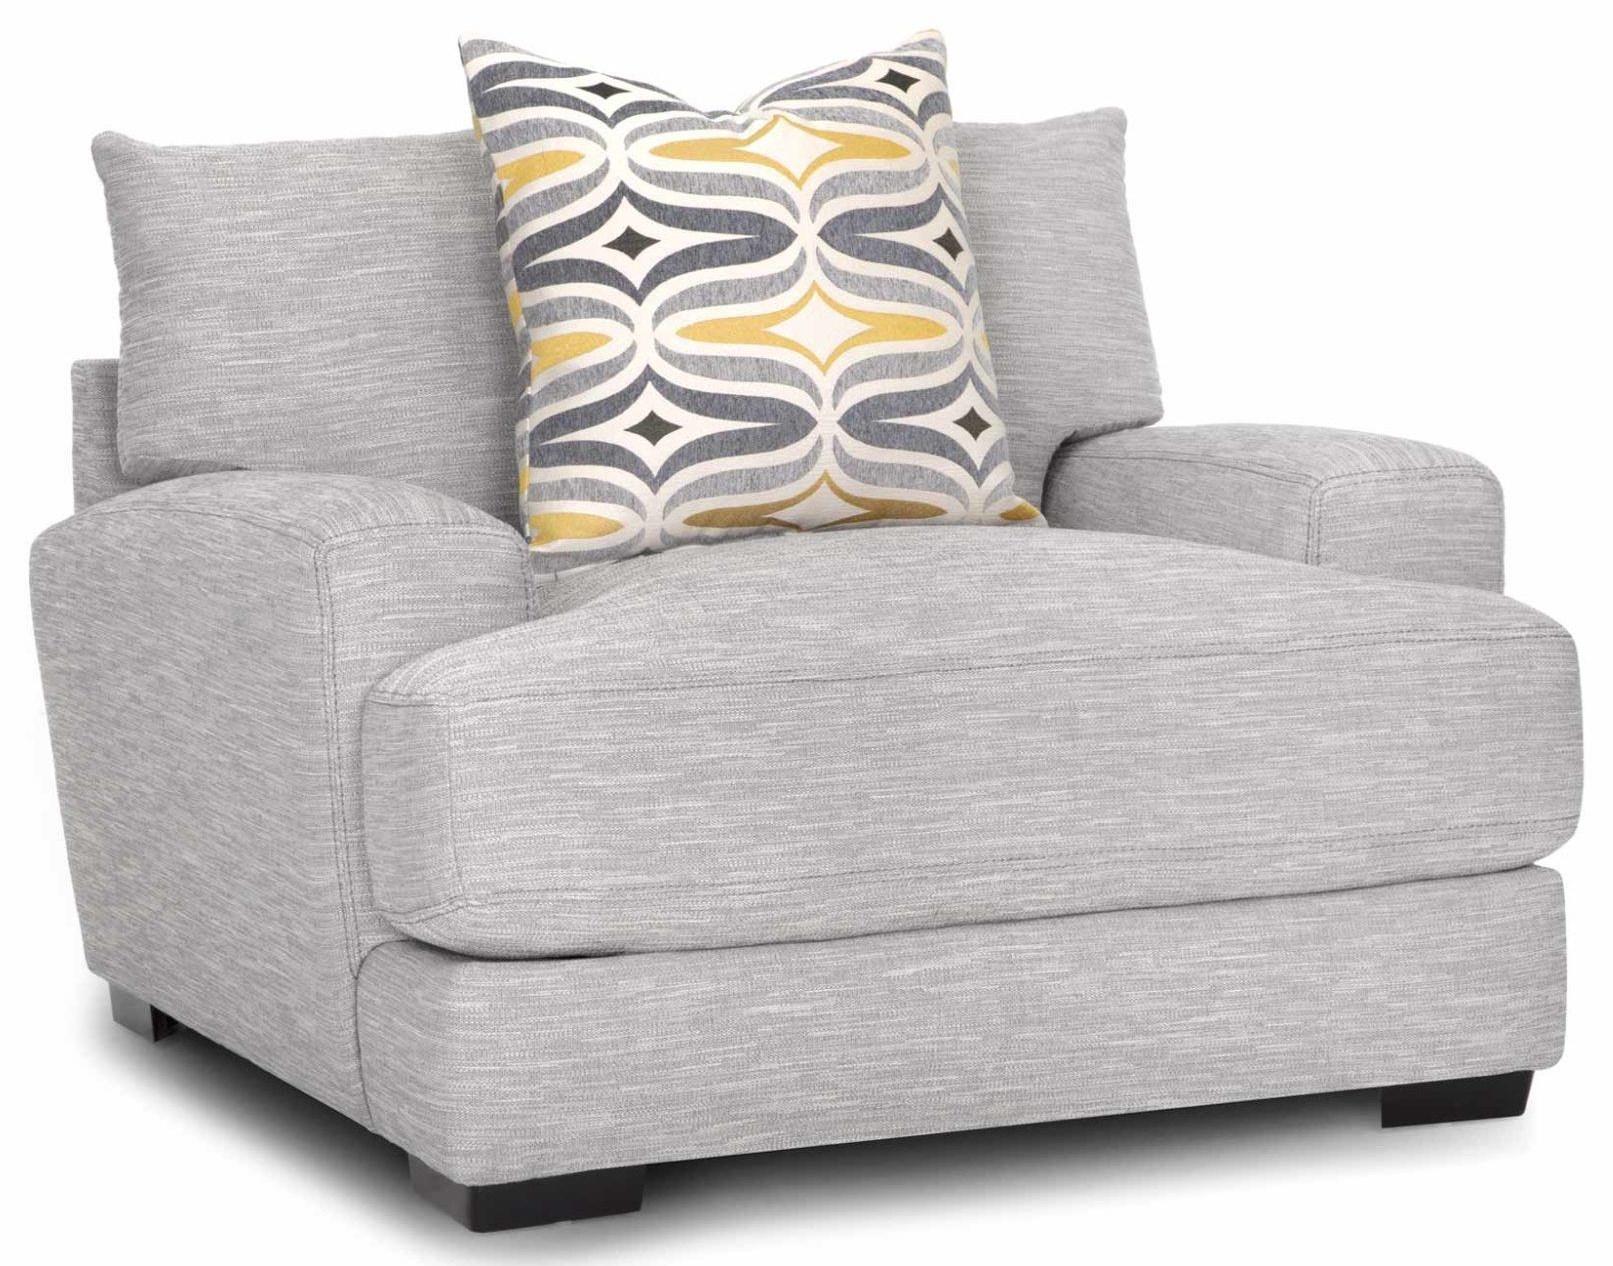 Barton Chair & A Half at Bennett's Furniture and Mattresses